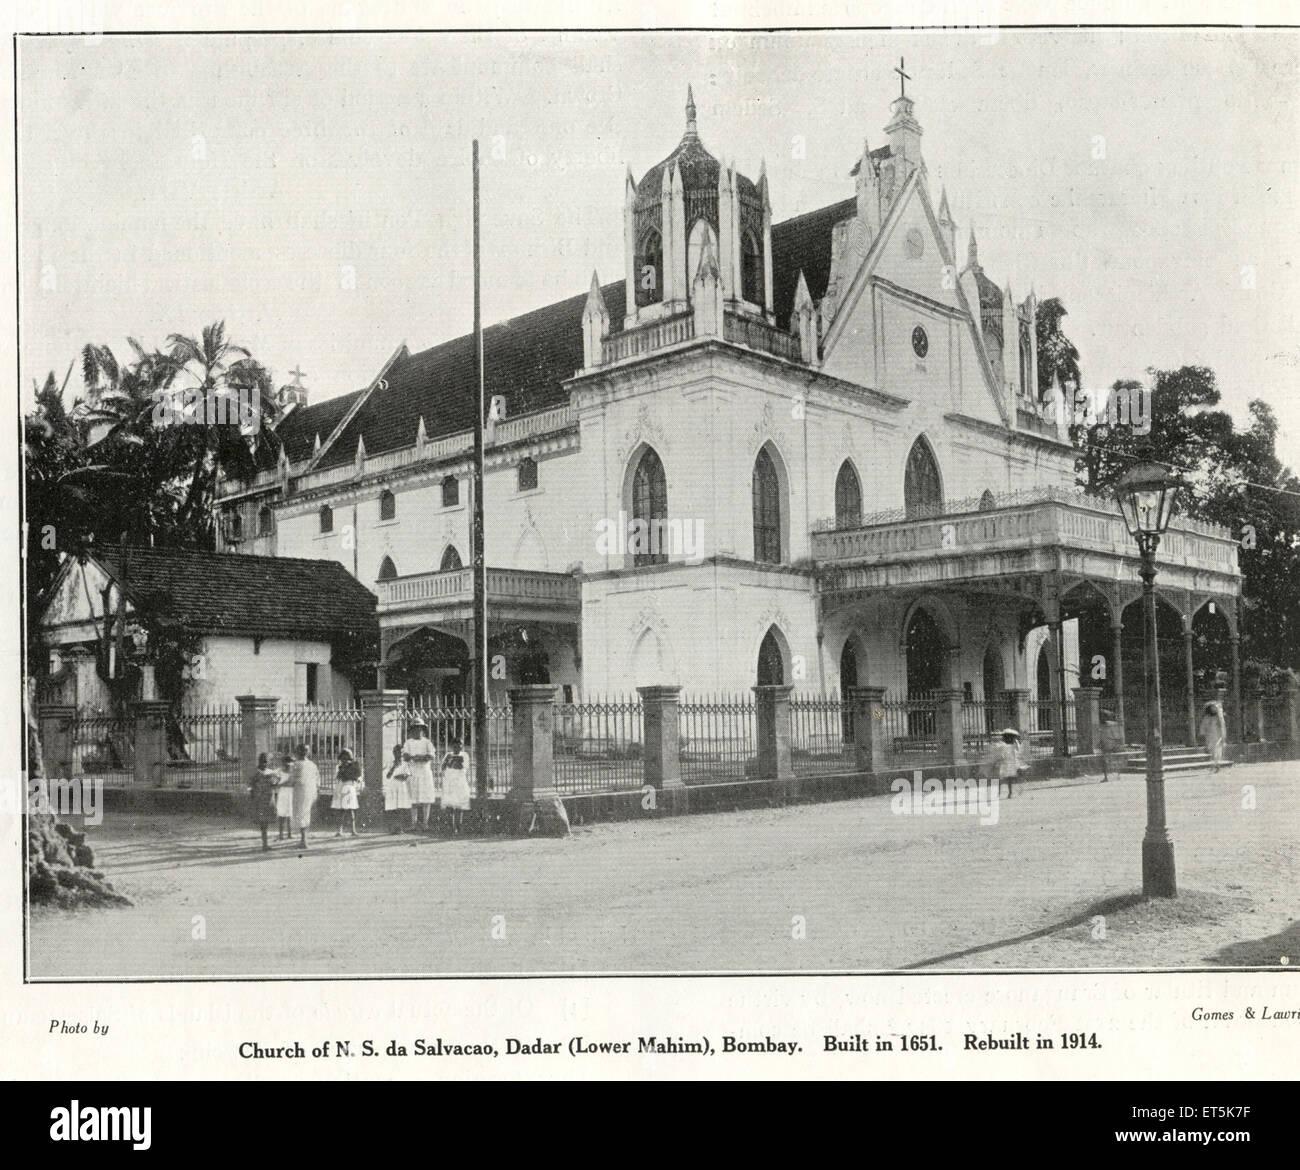 Catholic Community Church of N. S. da Salvacao ; Dadar Lower Mahim built in 1651rebuilt in 1914 ; Bombay Mumbai Stock Photo